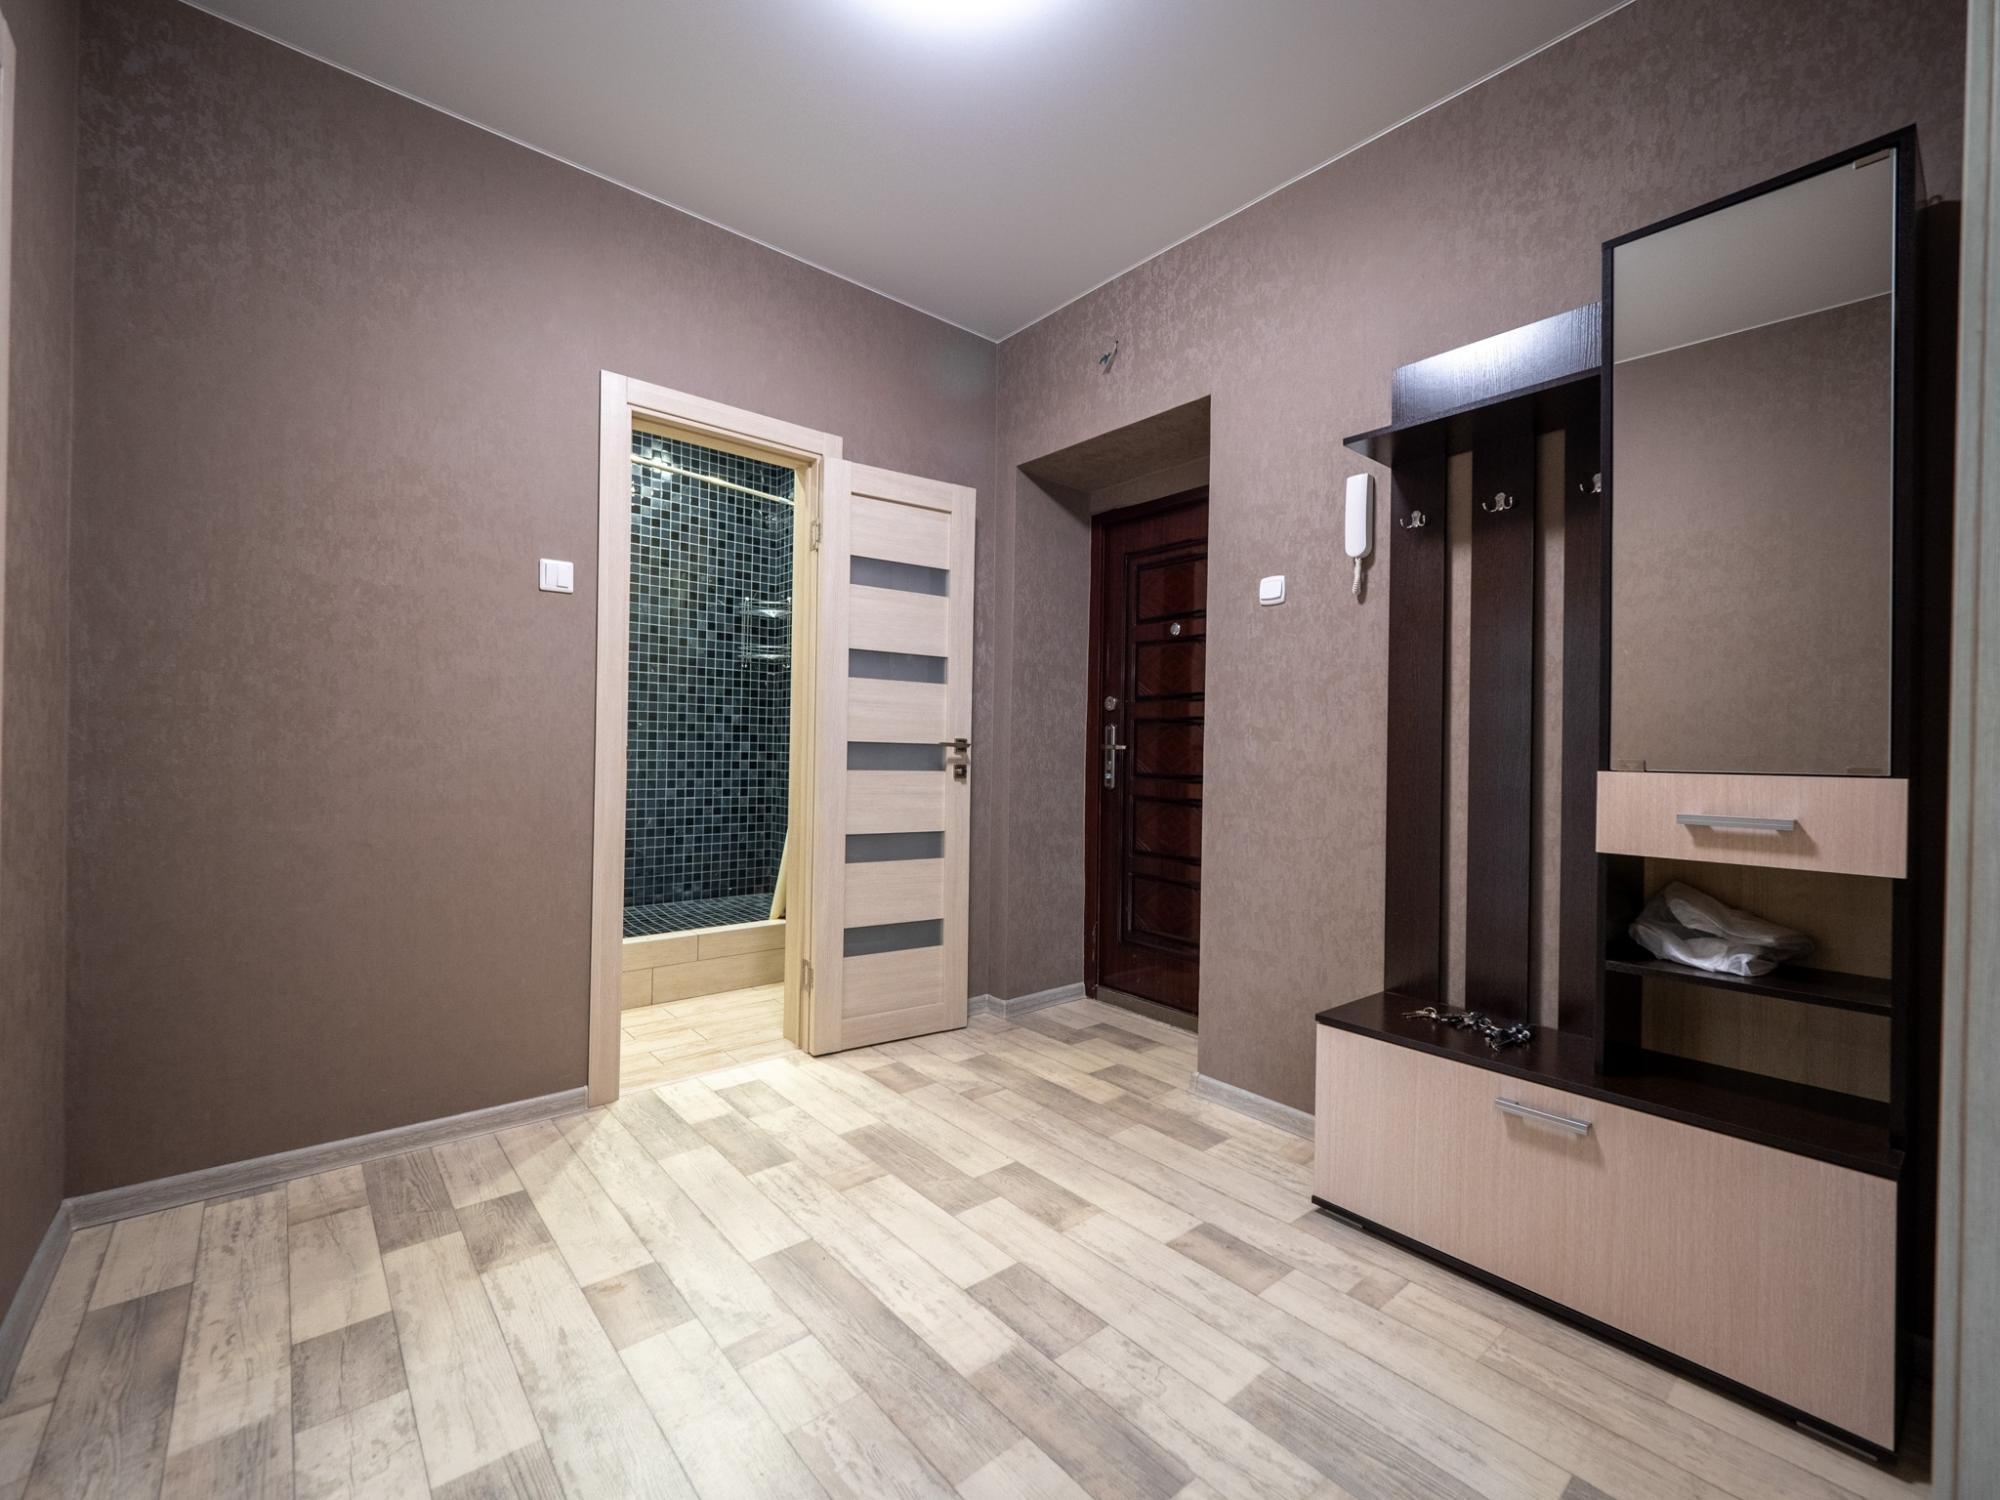 1к квартира улица Весны, 2а | 21000 | аренда в Красноярске фото 13